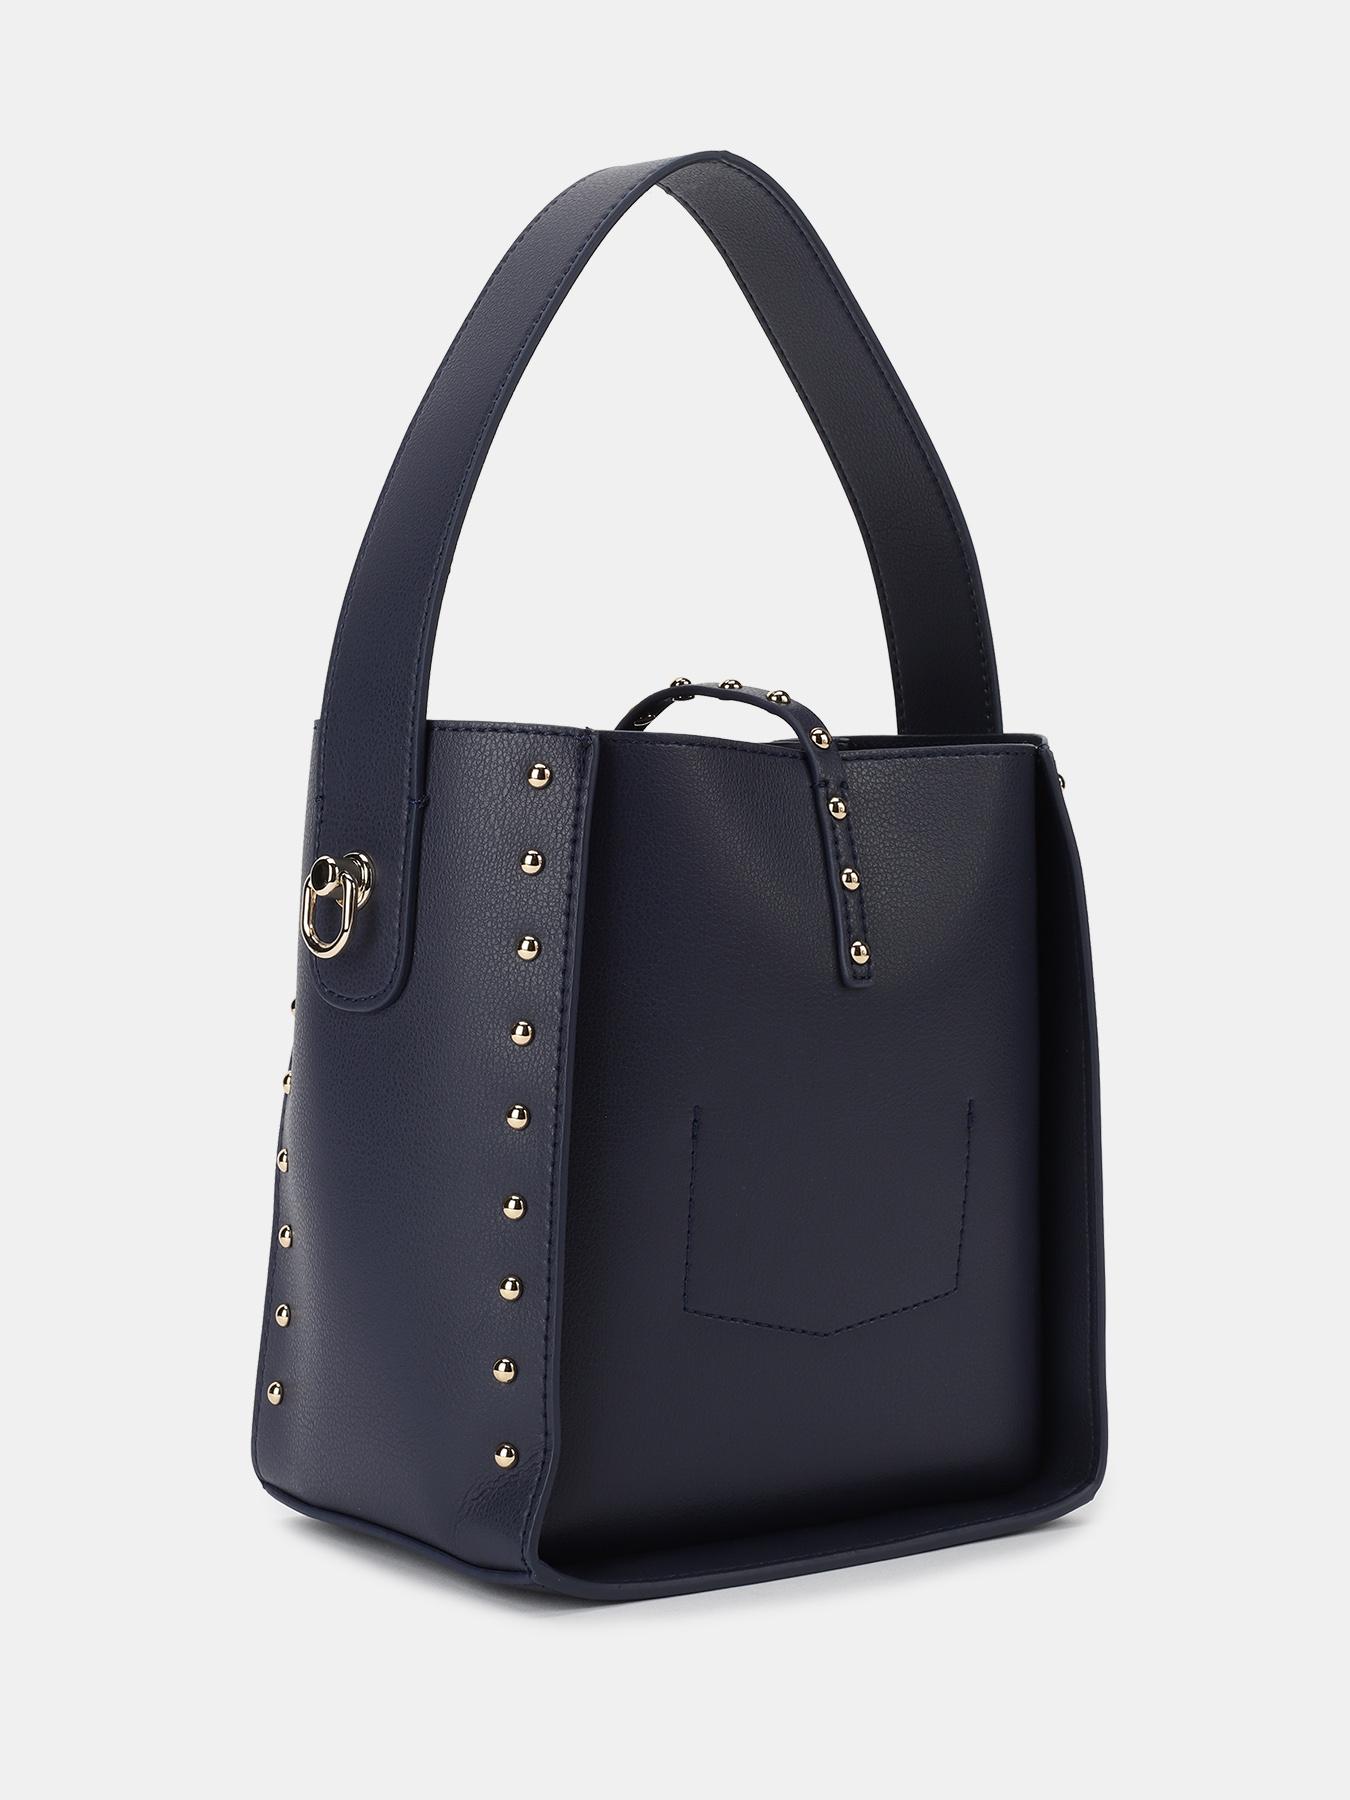 Trussardi Jeans Женская сумка 2 в 1 365205-185 Фото 2